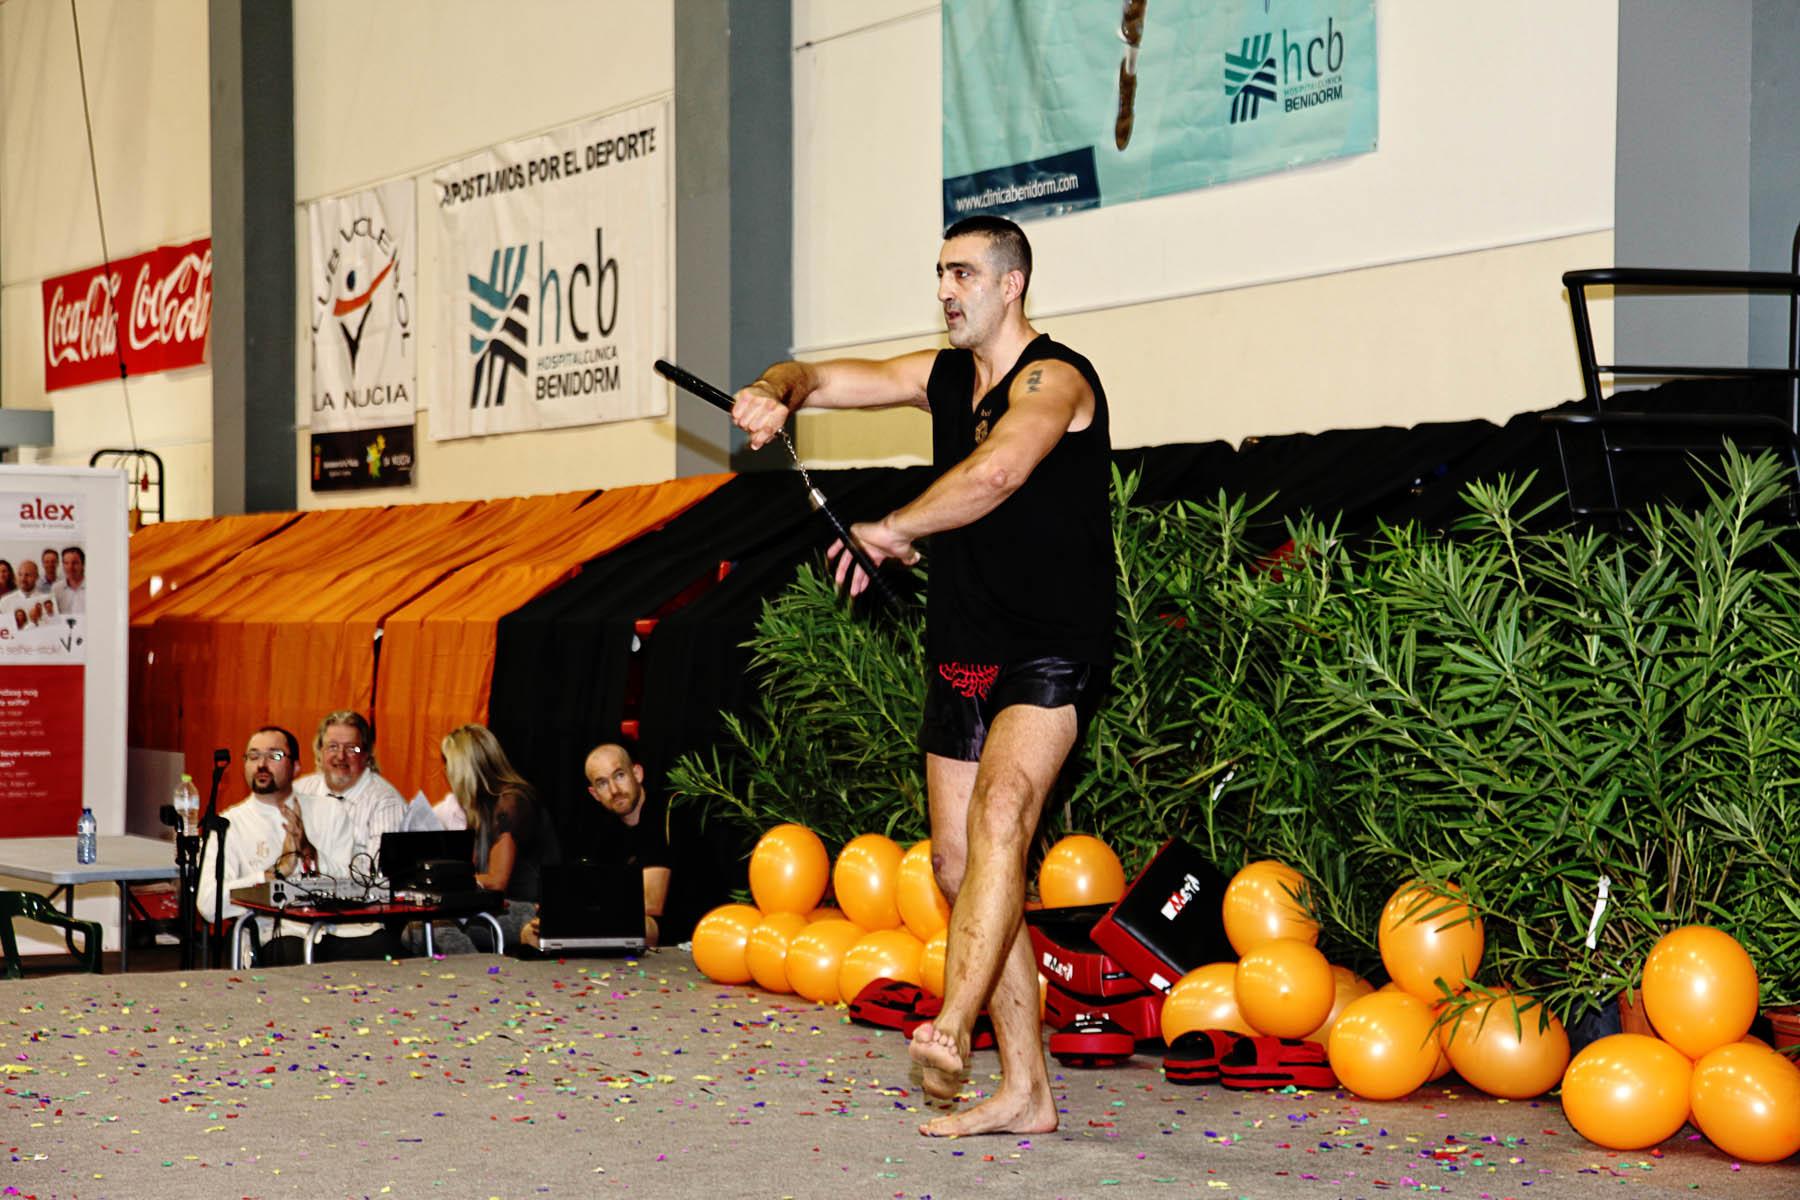 shakti yoga masage martial arts dance thai restaurant albir benidorm altea lanucia calpe alfas 15